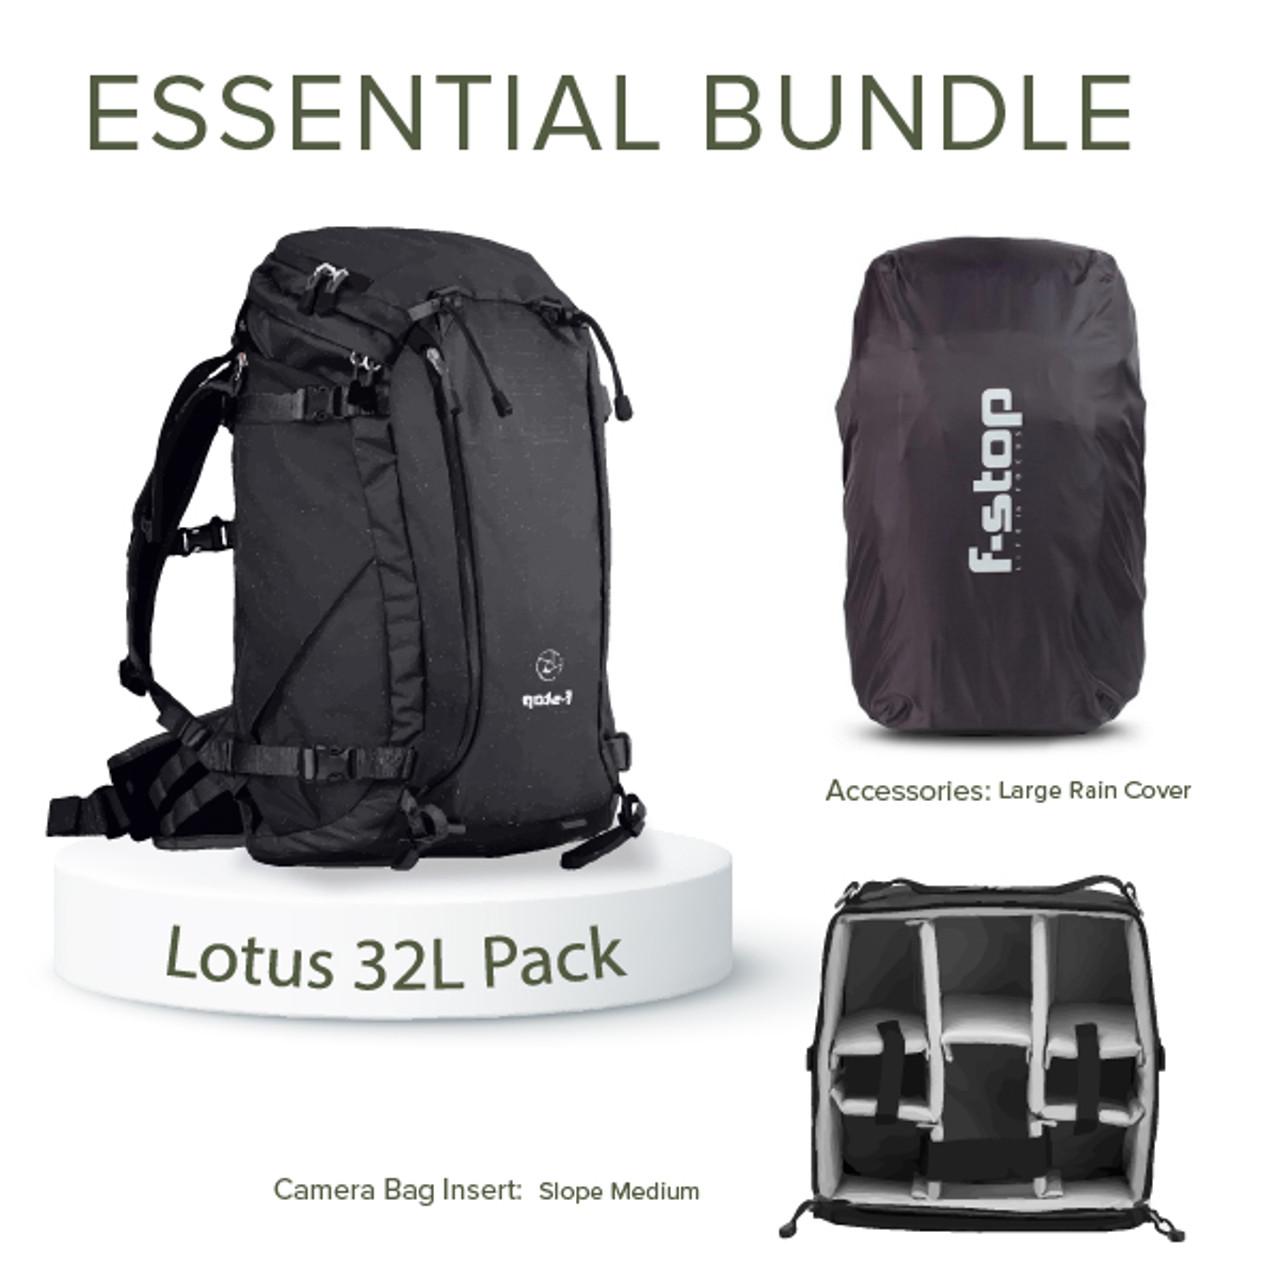 Lotus 32 Liter Backpack Essentials Bundle